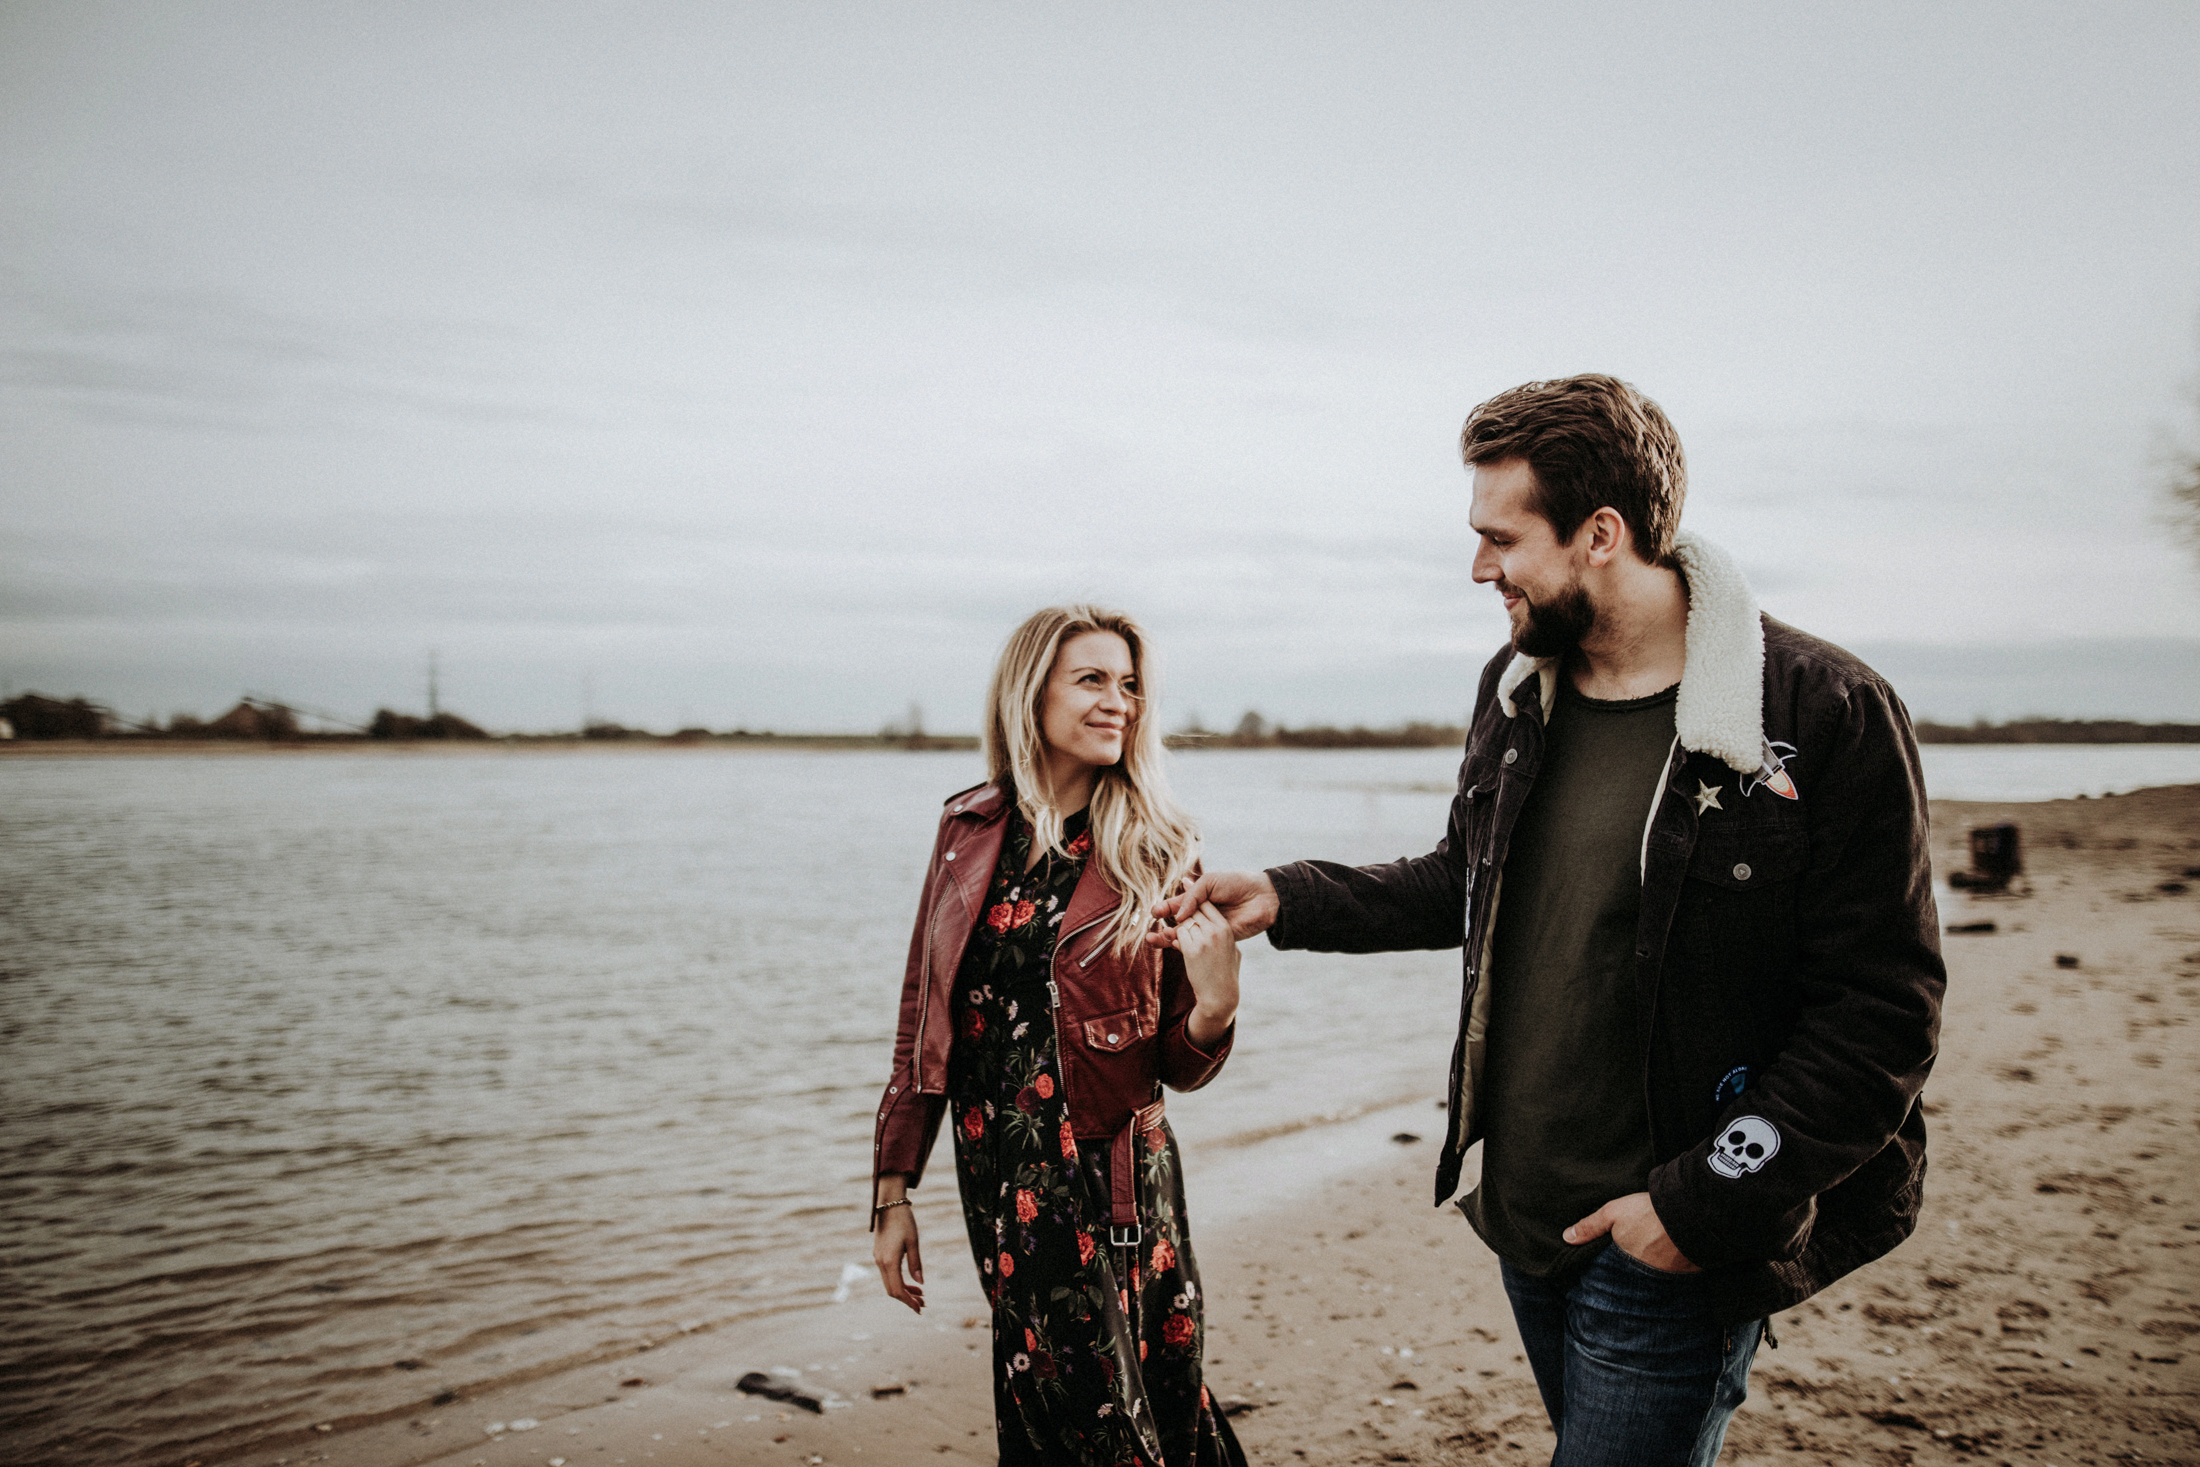 Wedding_Photographer_Mallorca_DanielaMarquardt_Photography_CanaryIslands_Lanzarote_Iceland_Tuscany_Santorini_Portugal_NewYork_Spain_Elopement_Hochzeitsfotograf_CK84